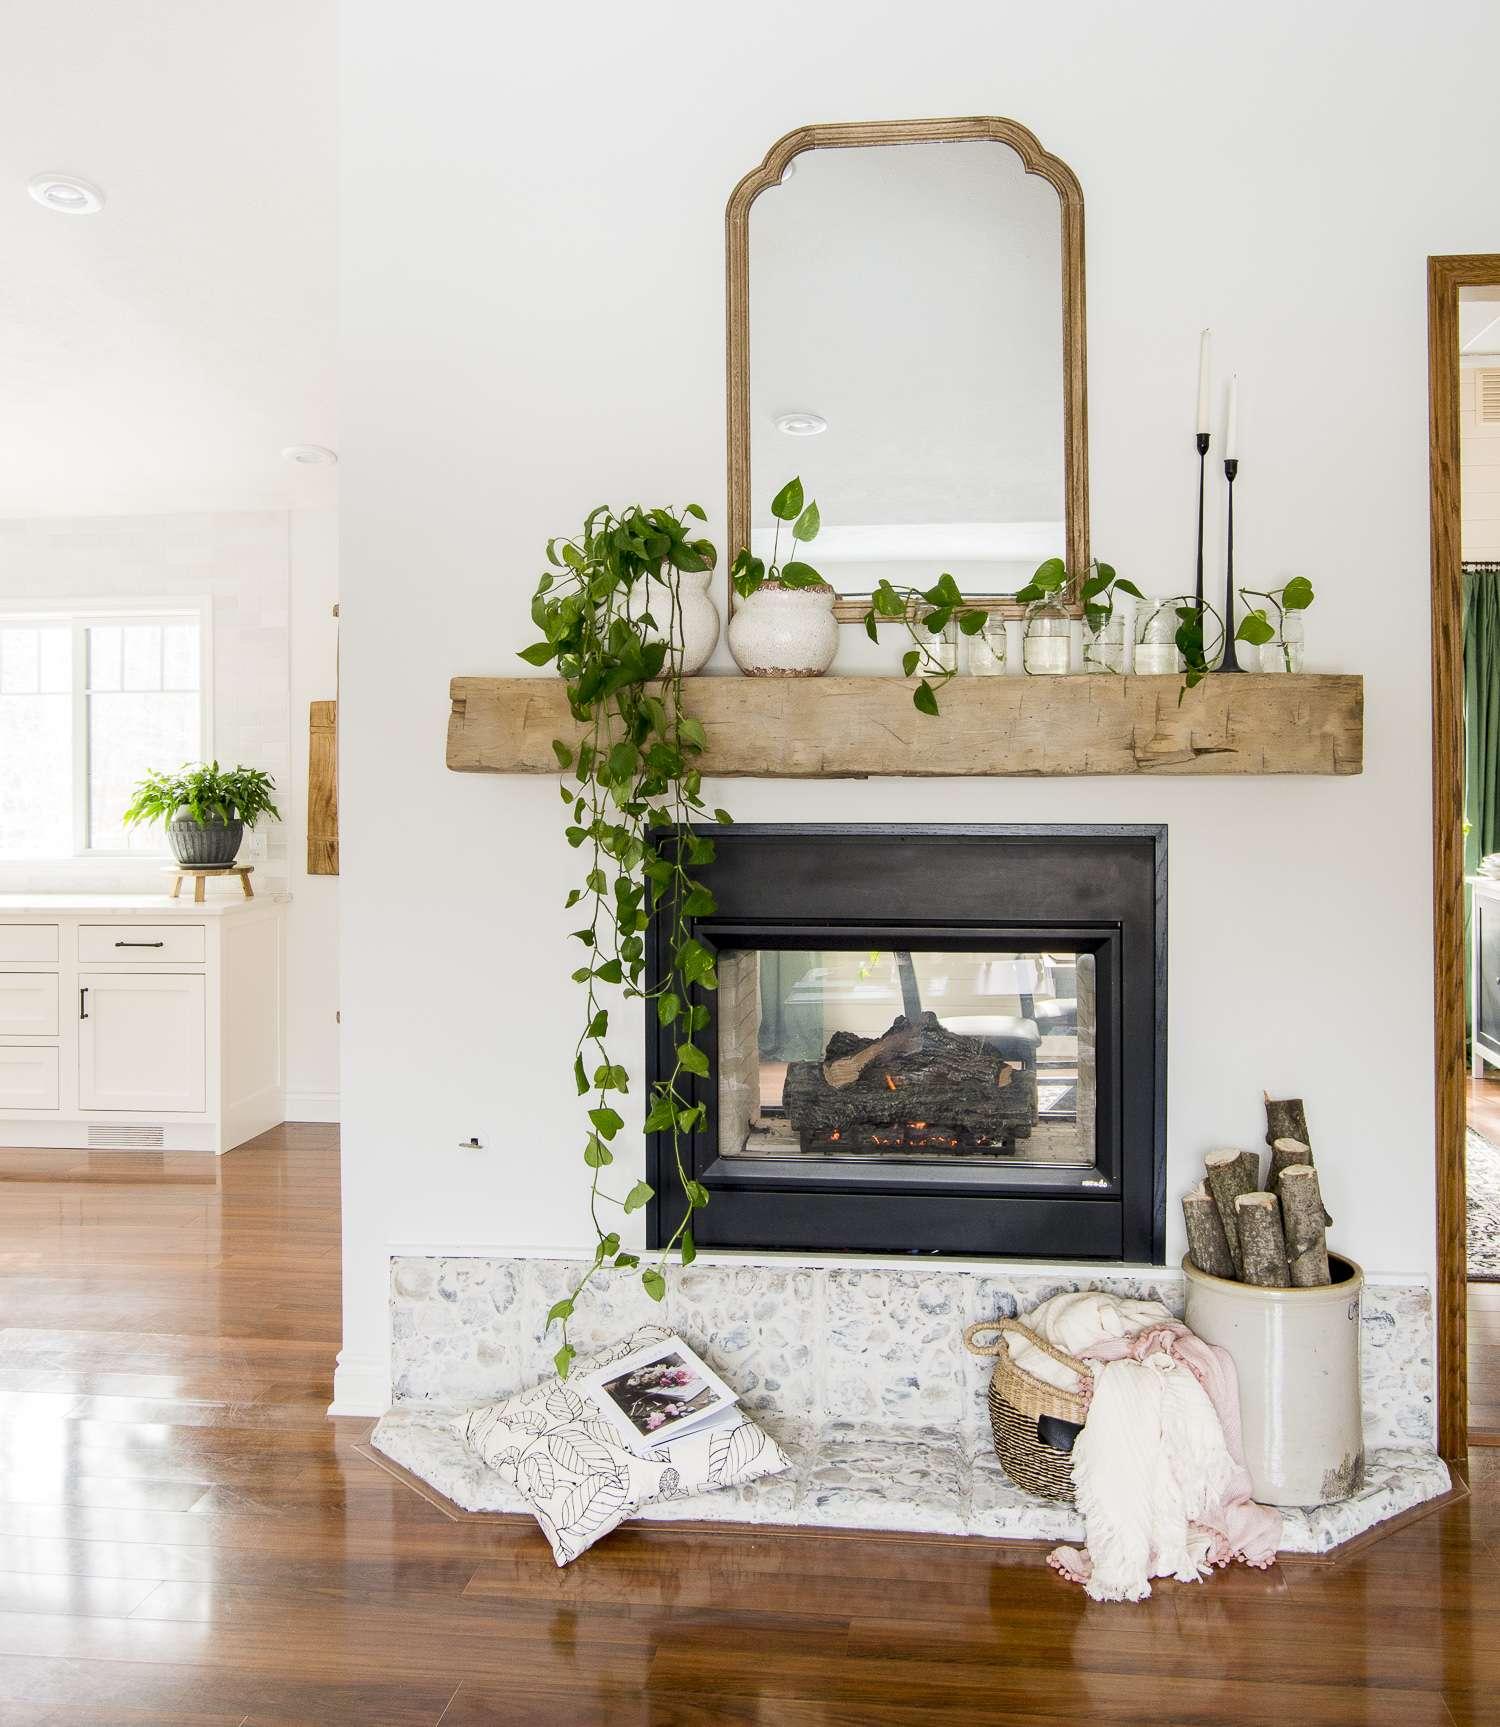 Propagating pothos as spring mantel decor.